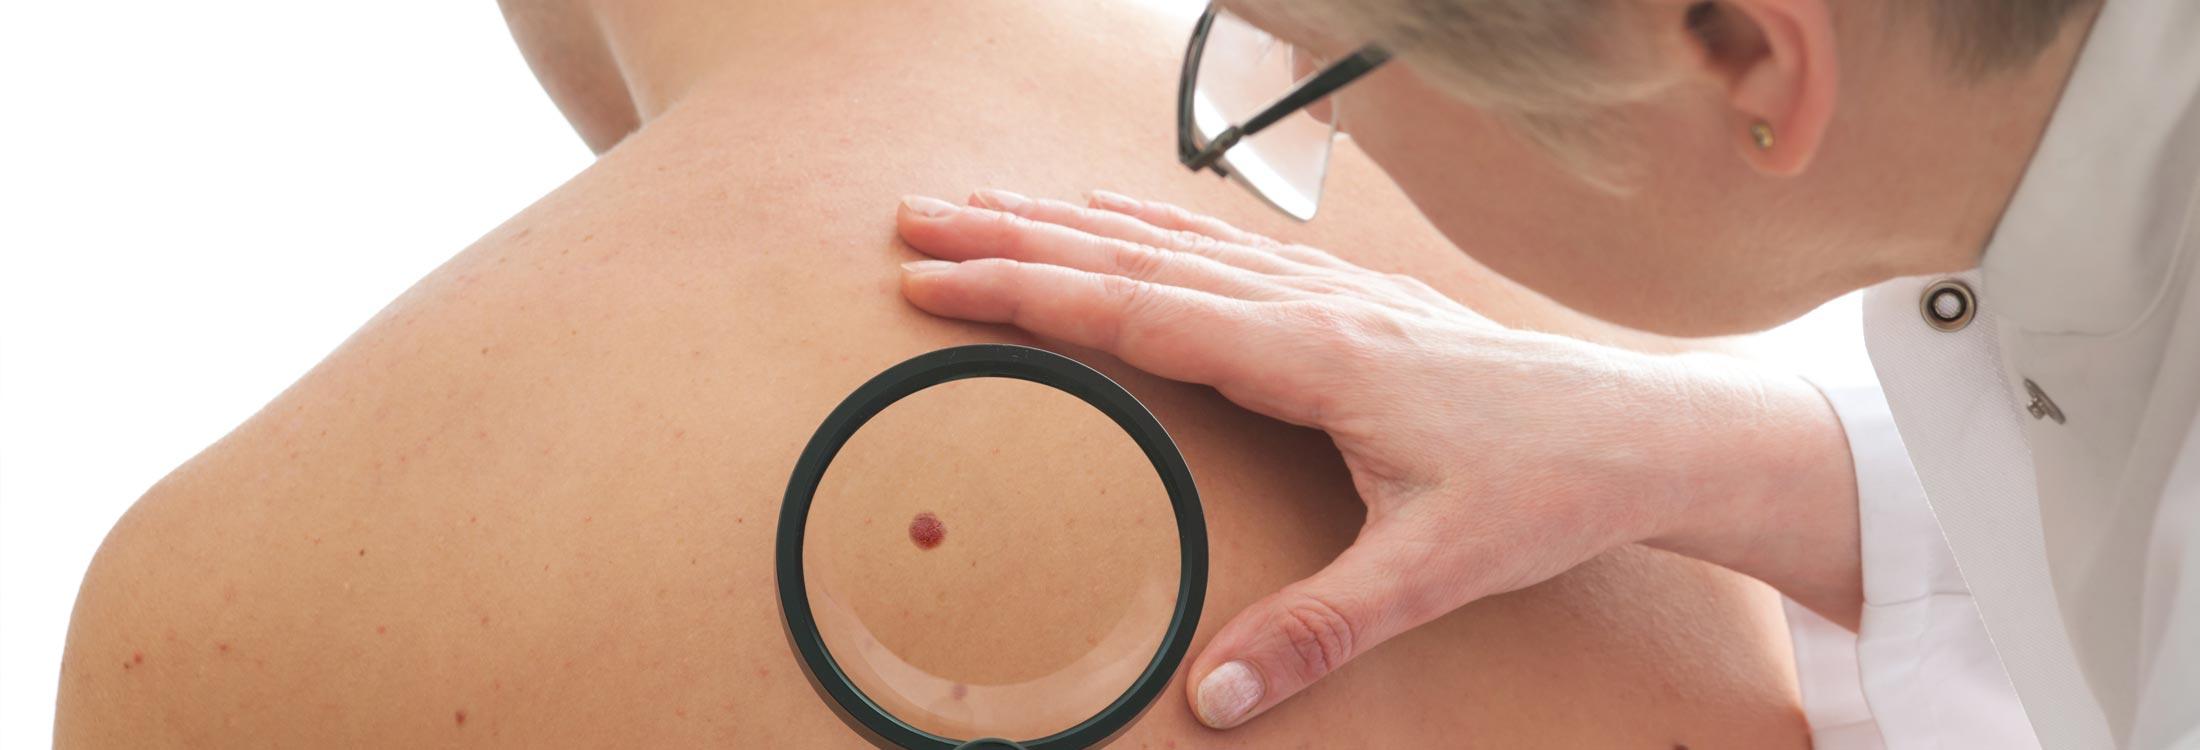 Radien Dermatology - Full Skin Examinations for Cancer